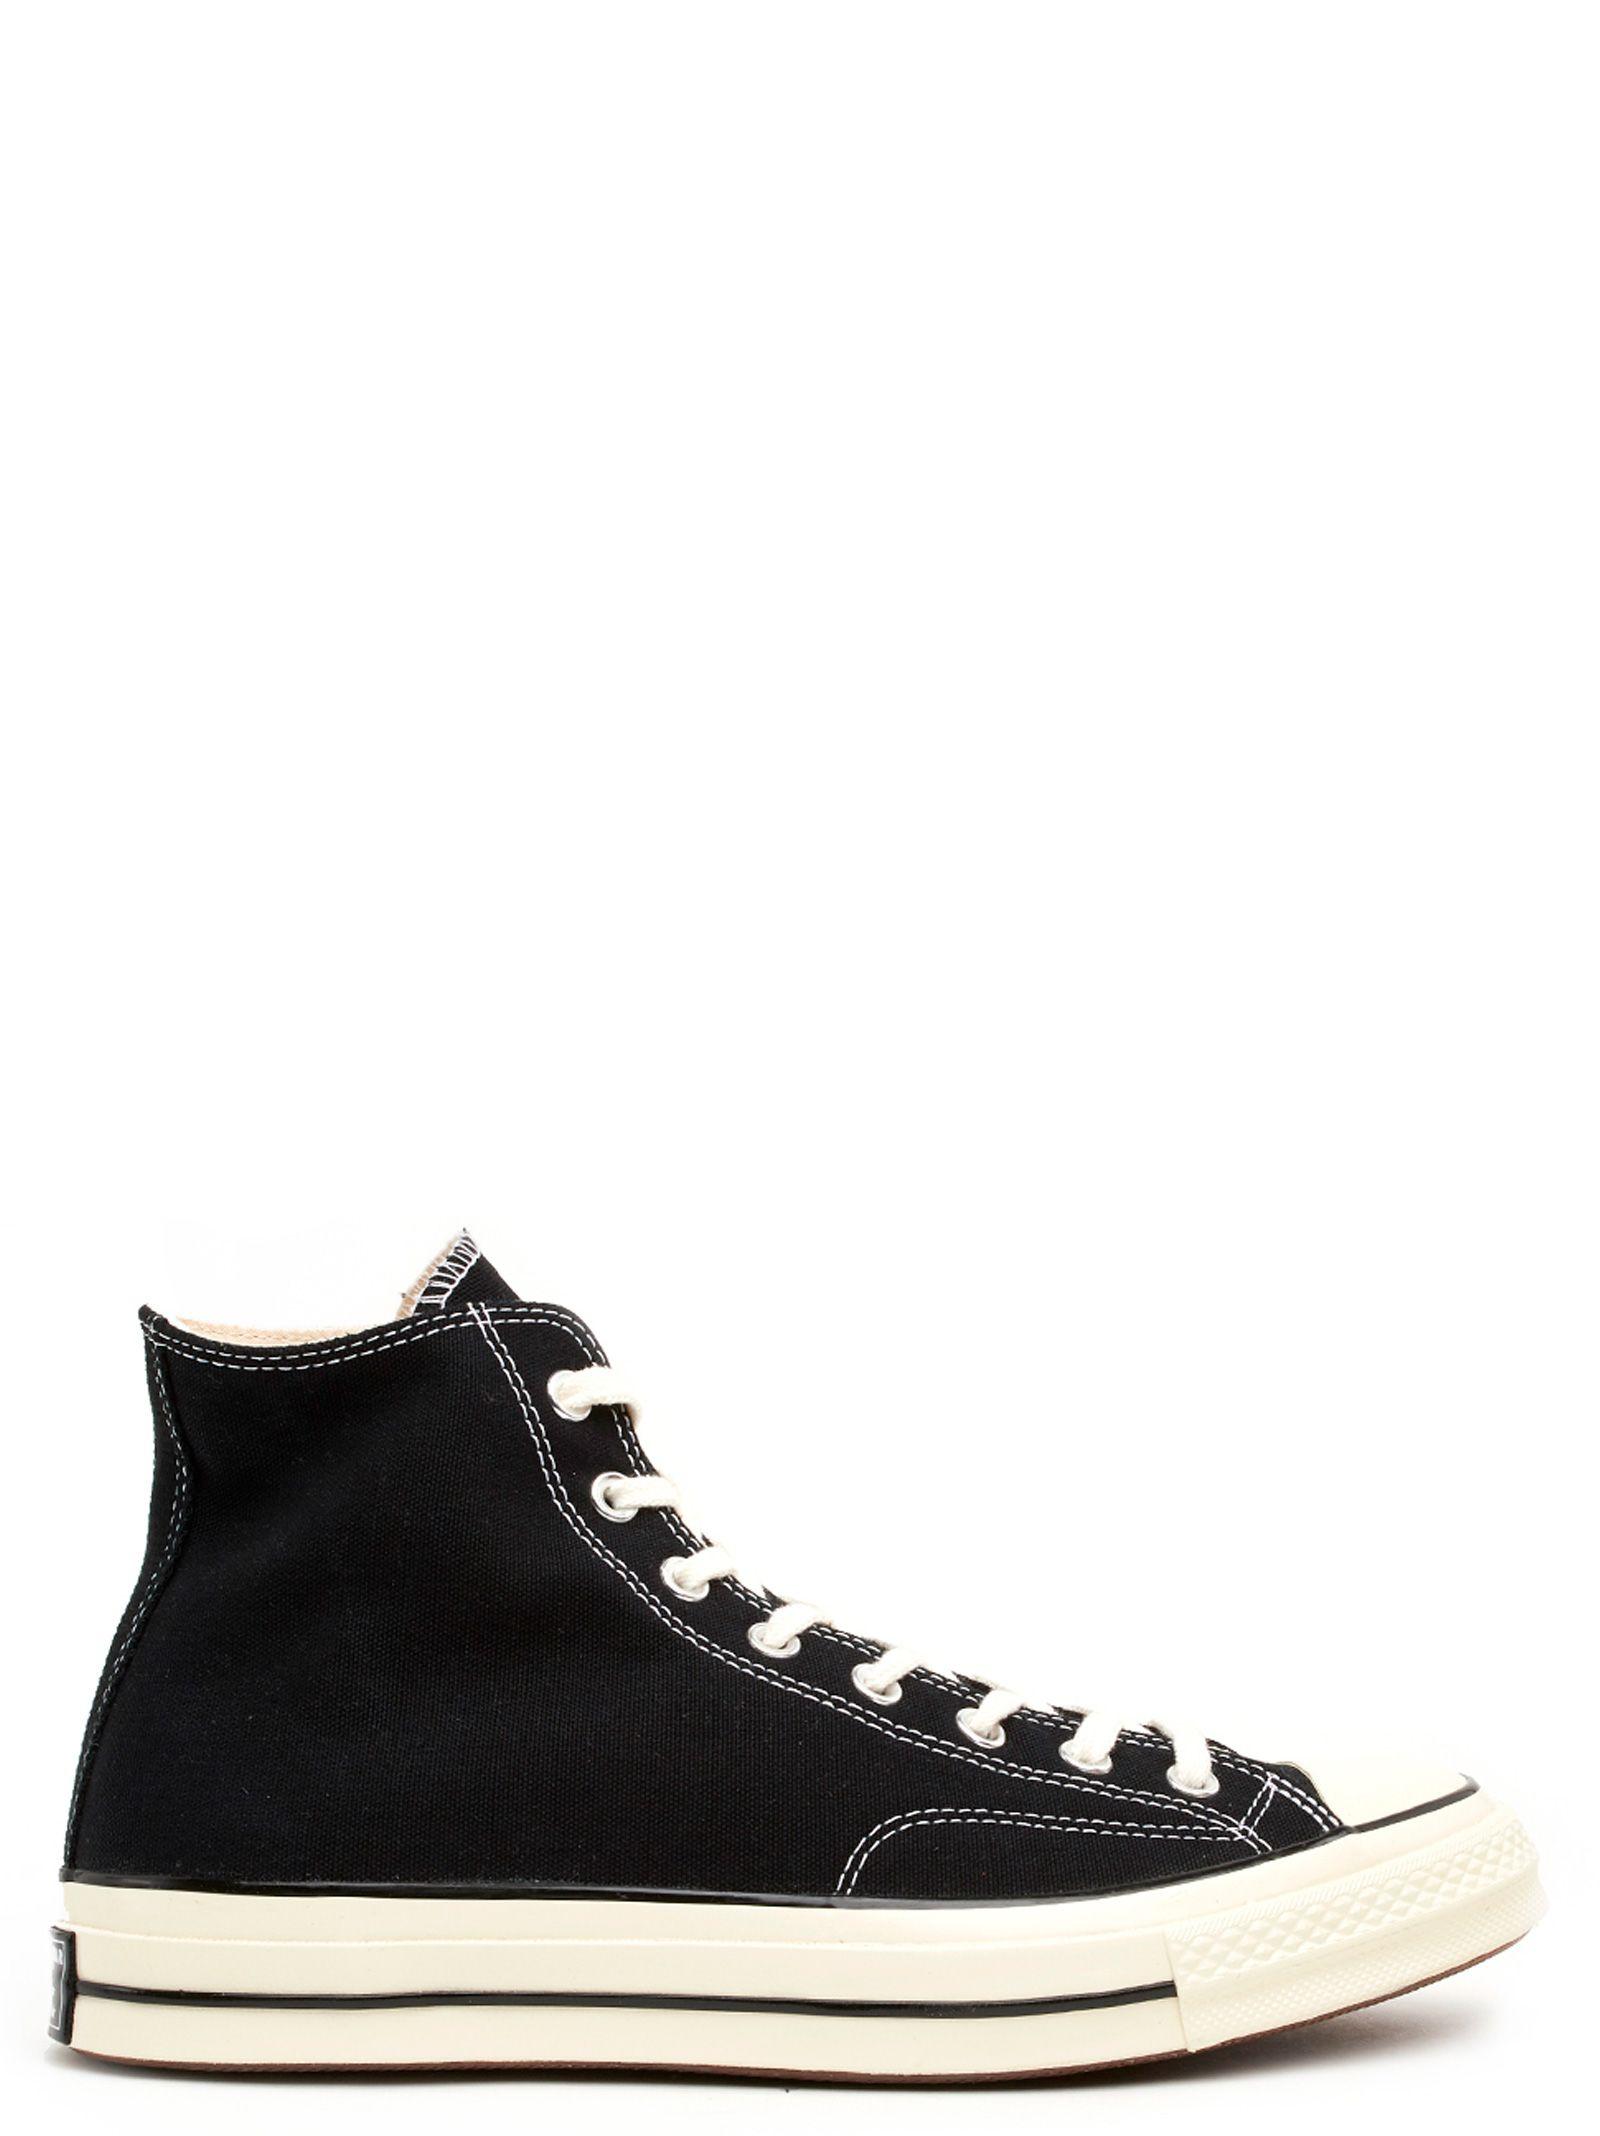 Converse 'chuck Taylor 1970s' Shoes